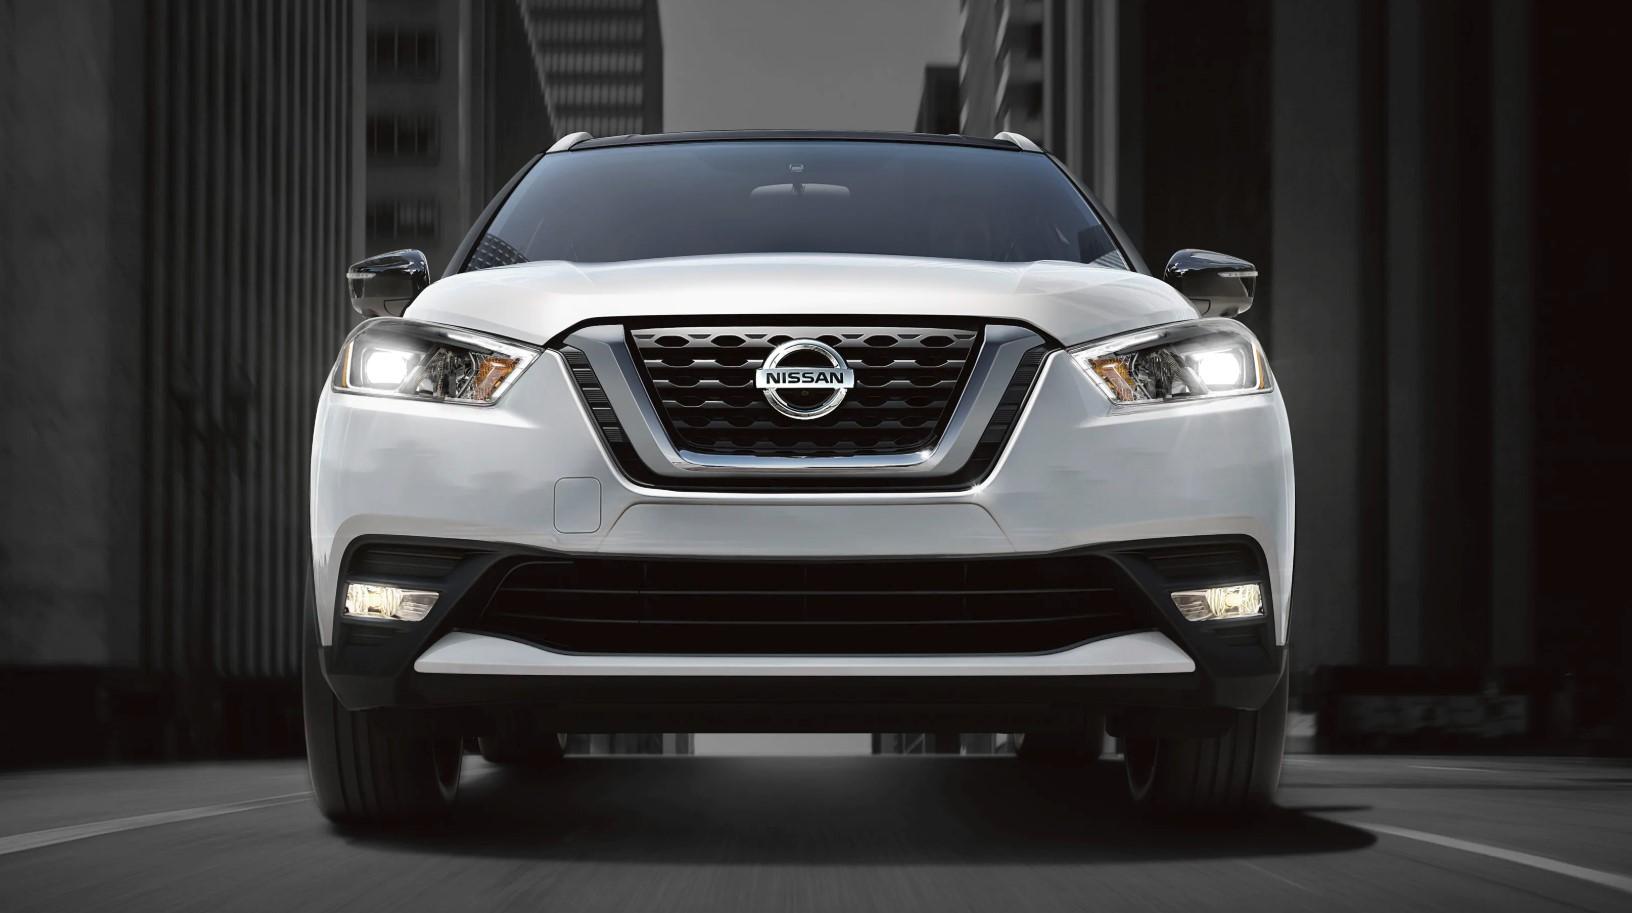 2019 Nissan Kicks Leasing near Sacramento, CA